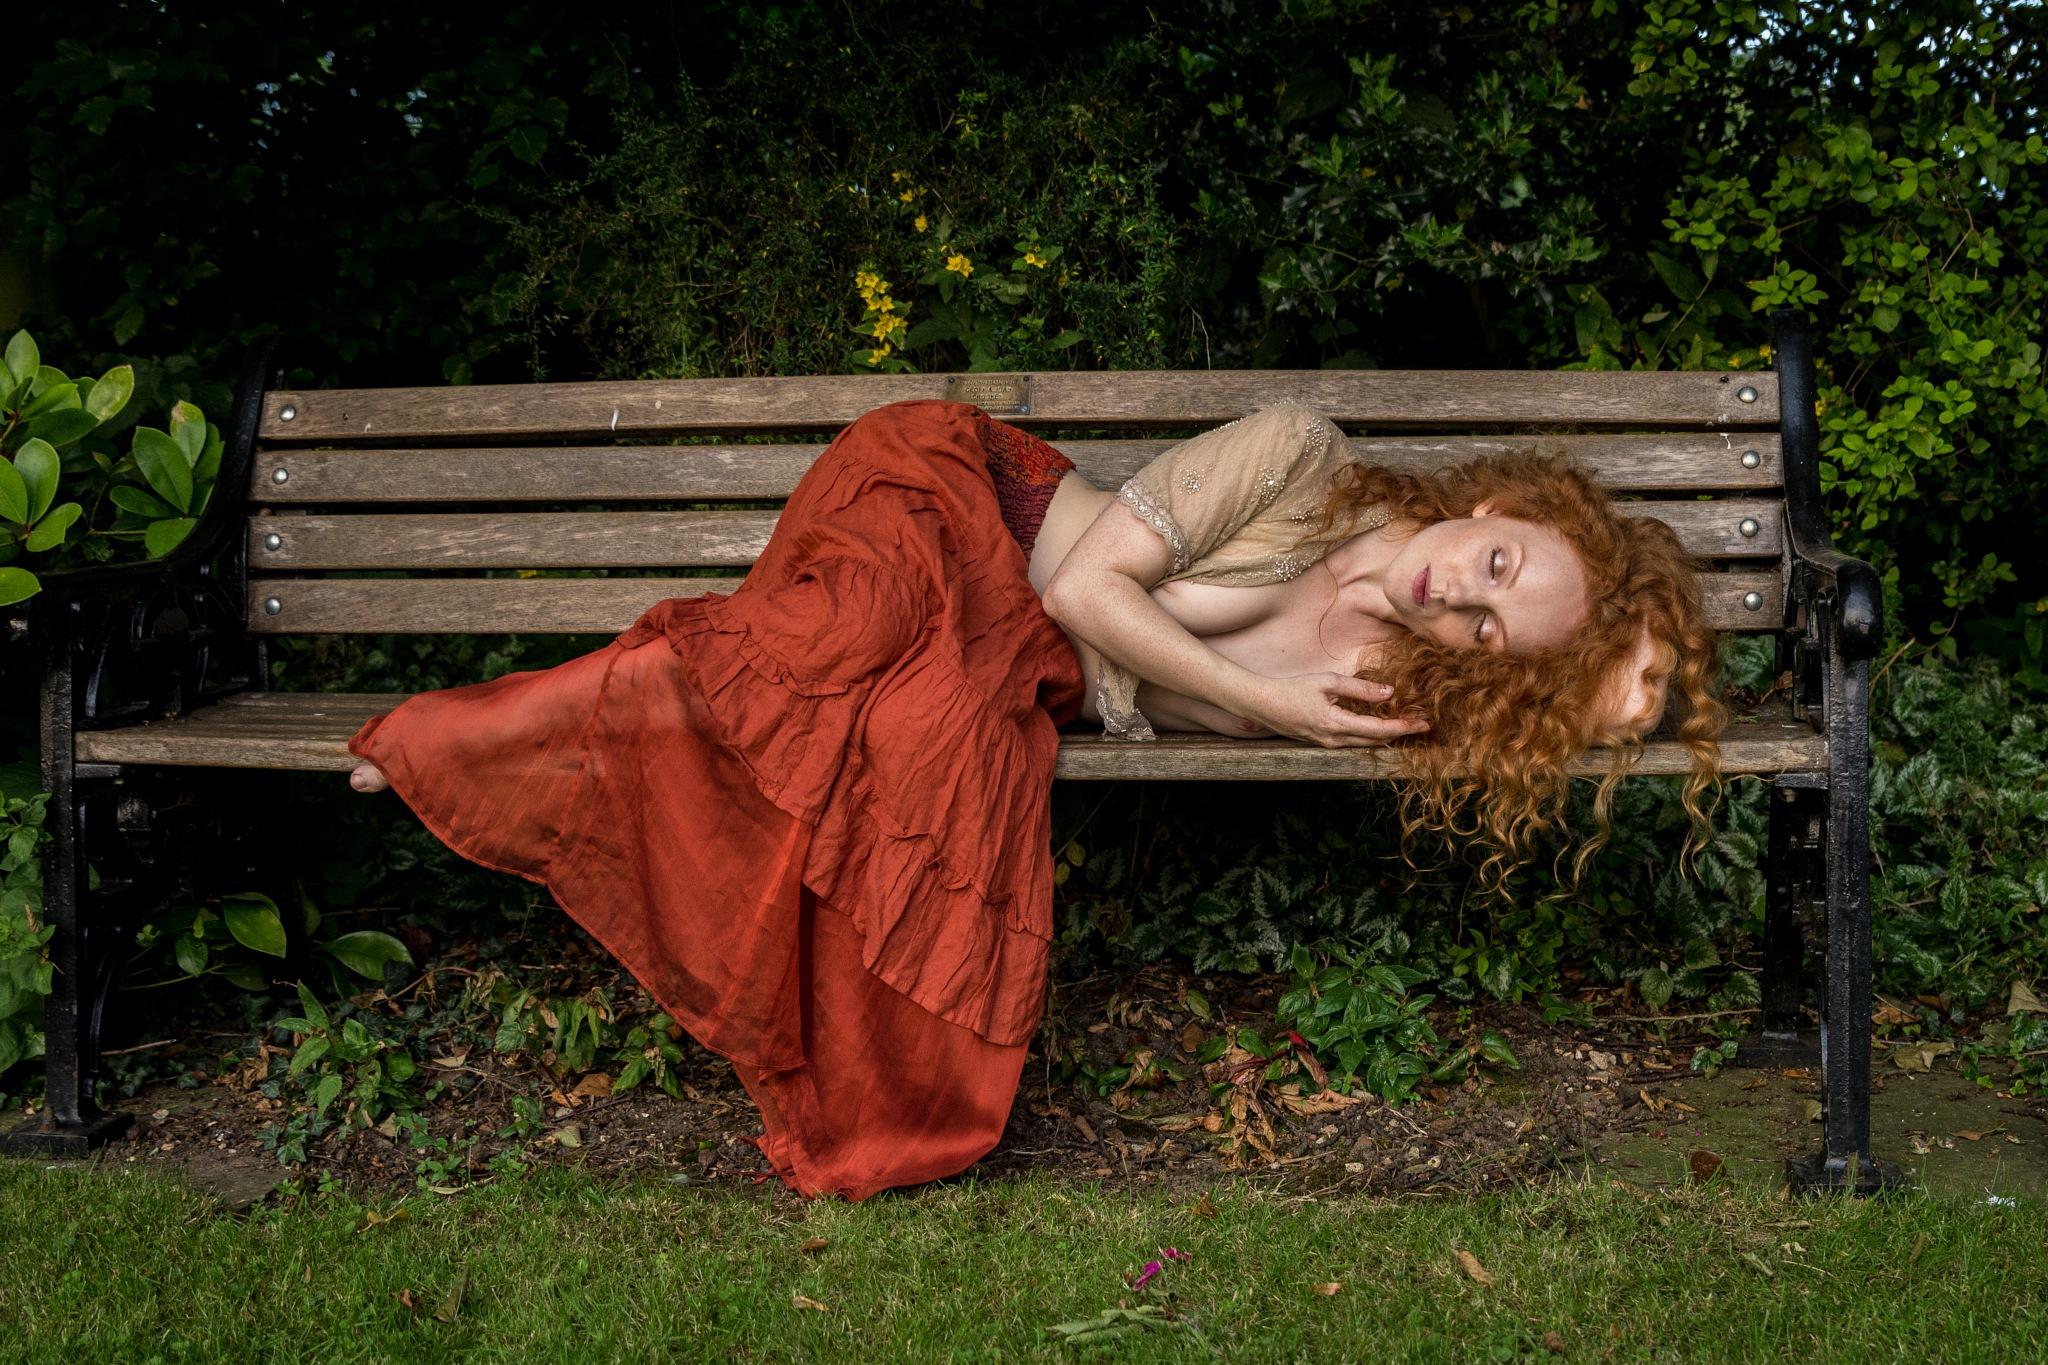 Sleeping beauty by D Whitehead